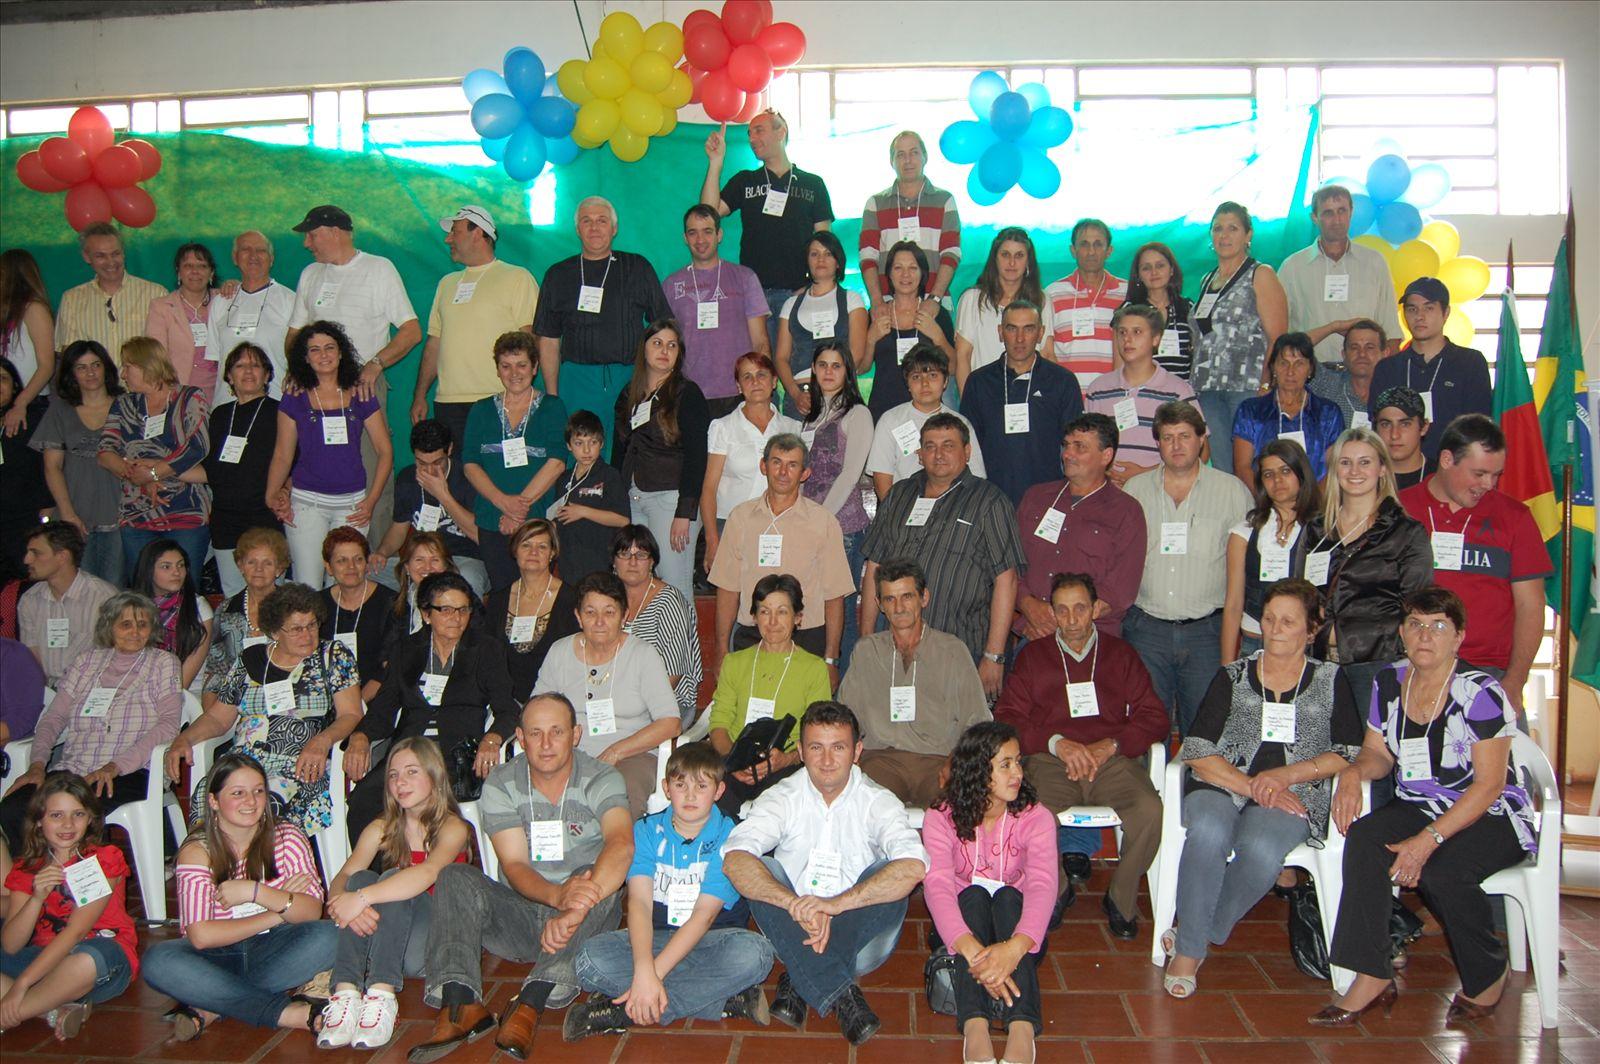 2º Encontro Família Cornelli - 11.10.2009 (168)_0